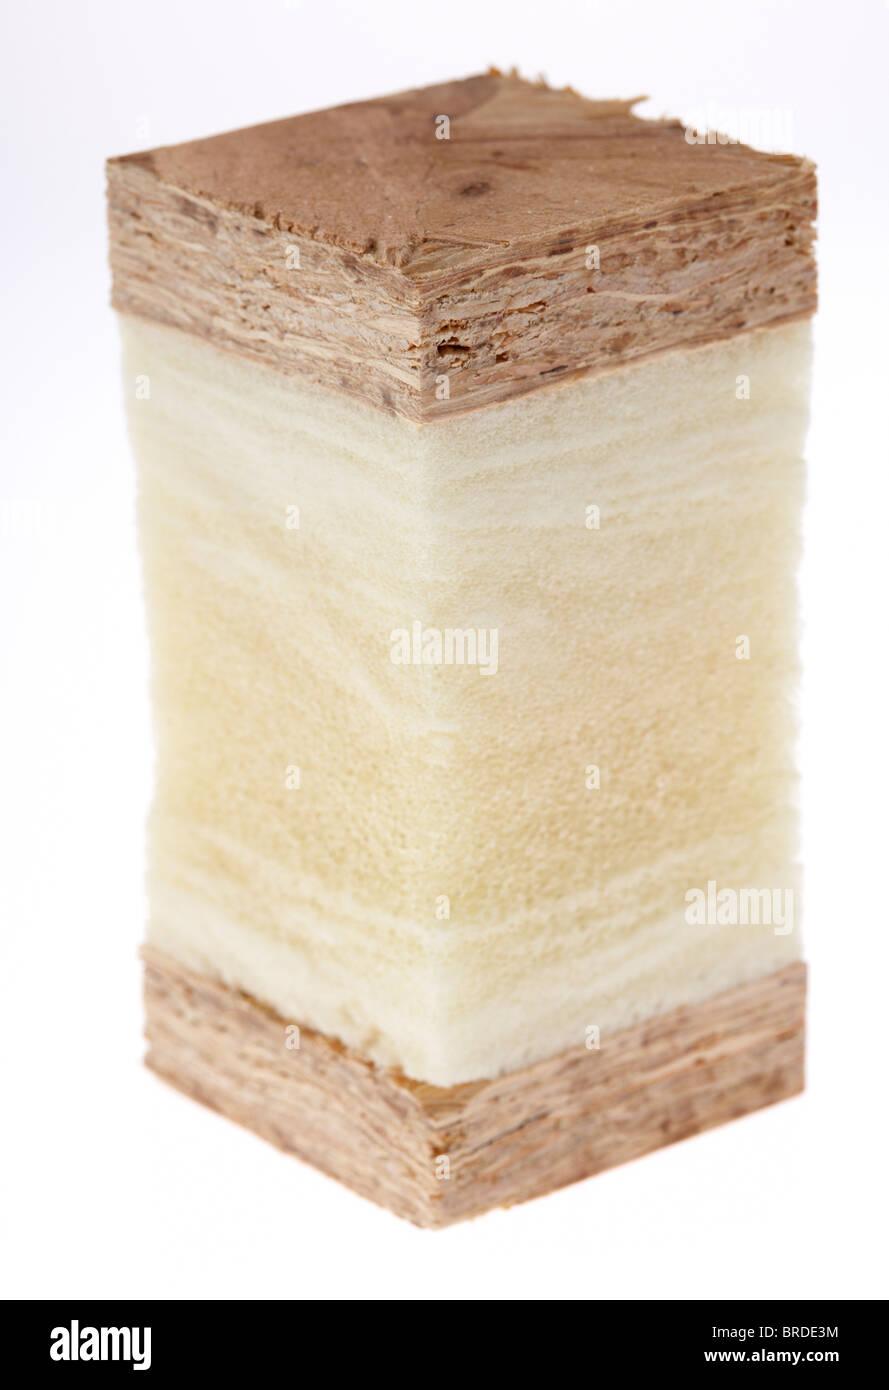 Corte transversal de un paneles aislados estructurales moderna construcción aislada de marcos de madera Imagen De Stock